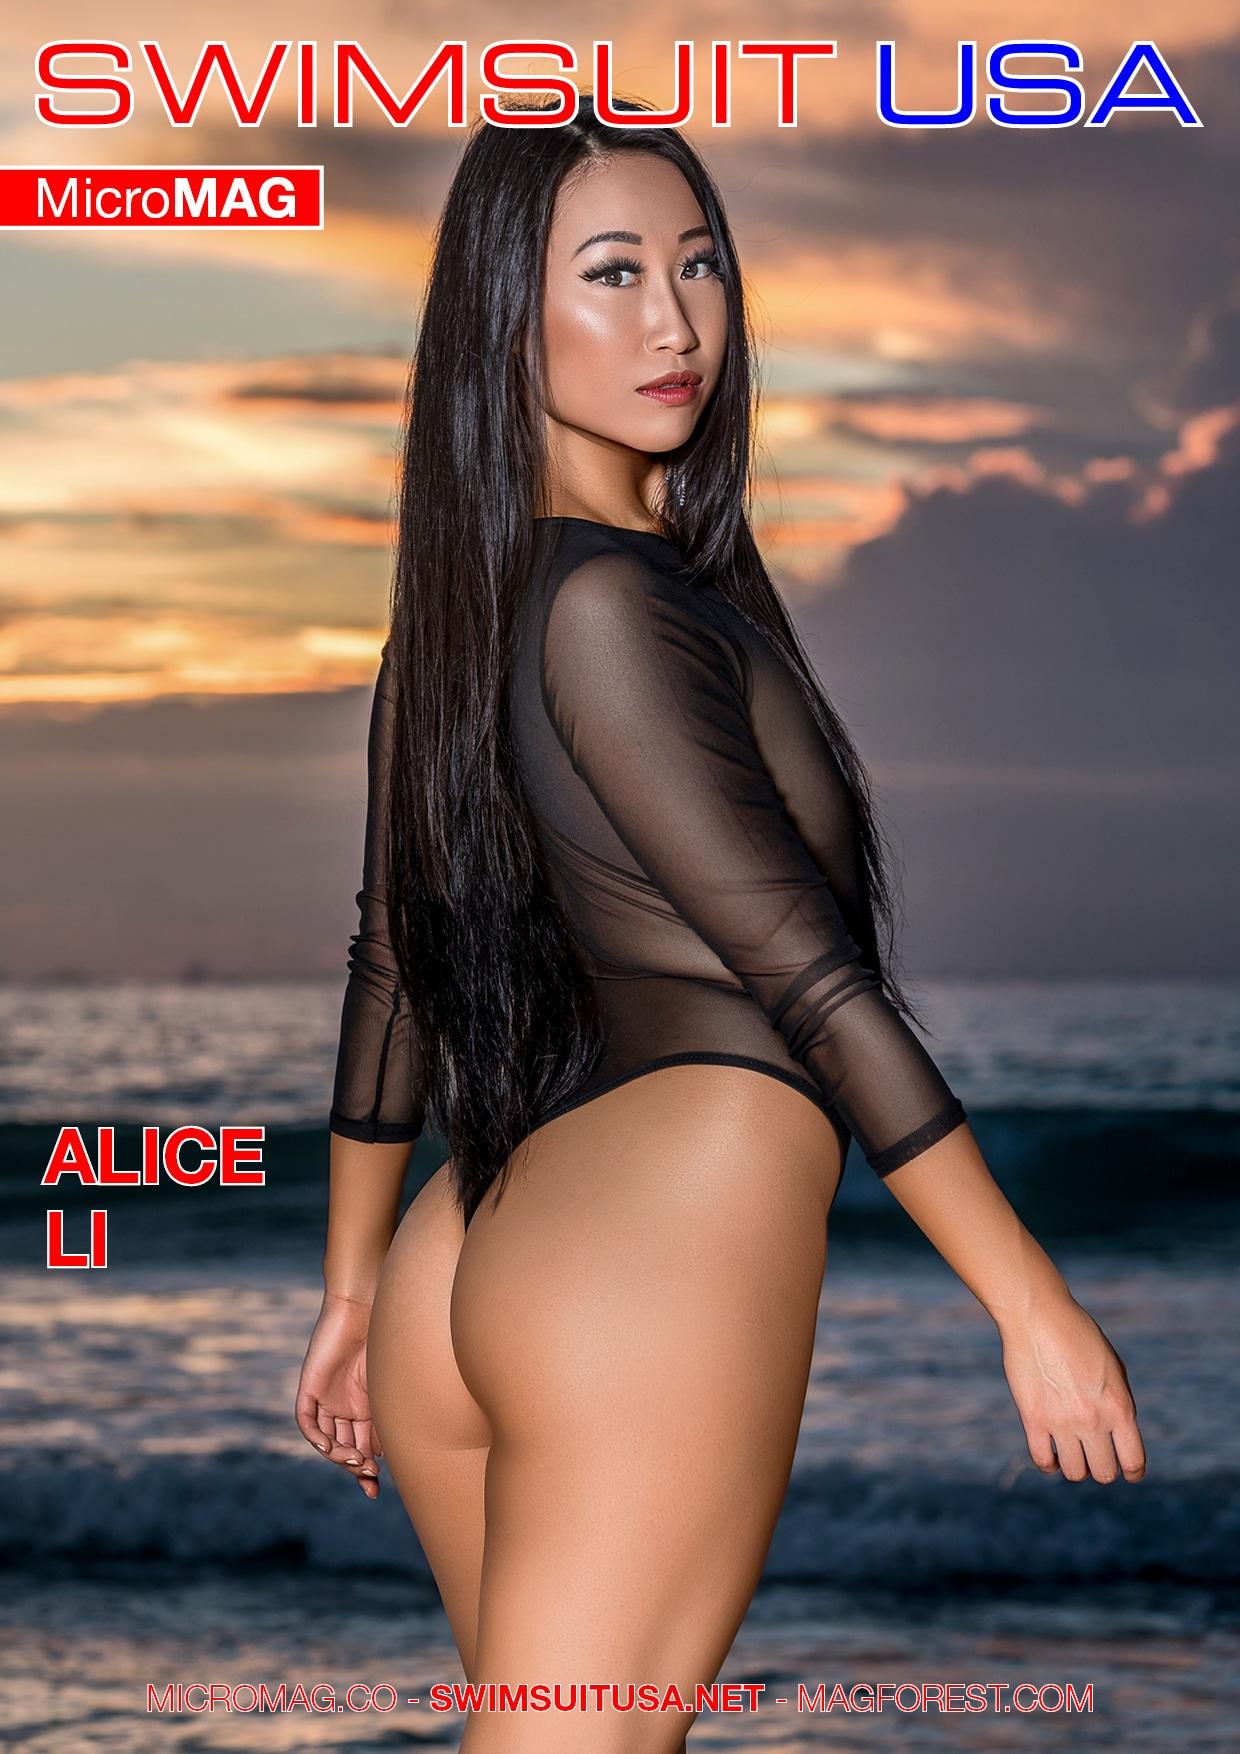 Swimsuit USA MicroMAG - Alice Li - Issue 2 3